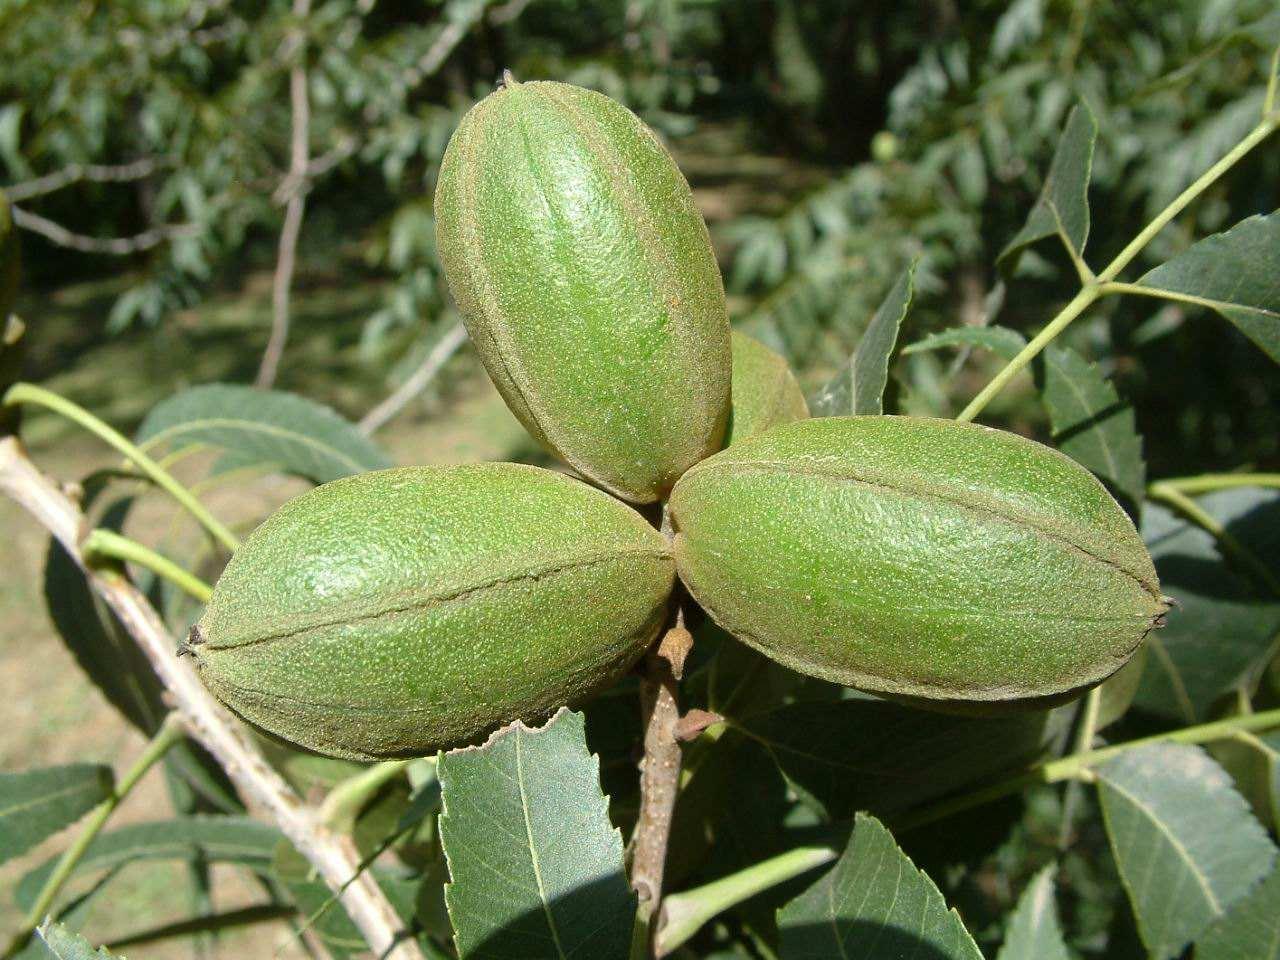 Carya illinoinensis seed